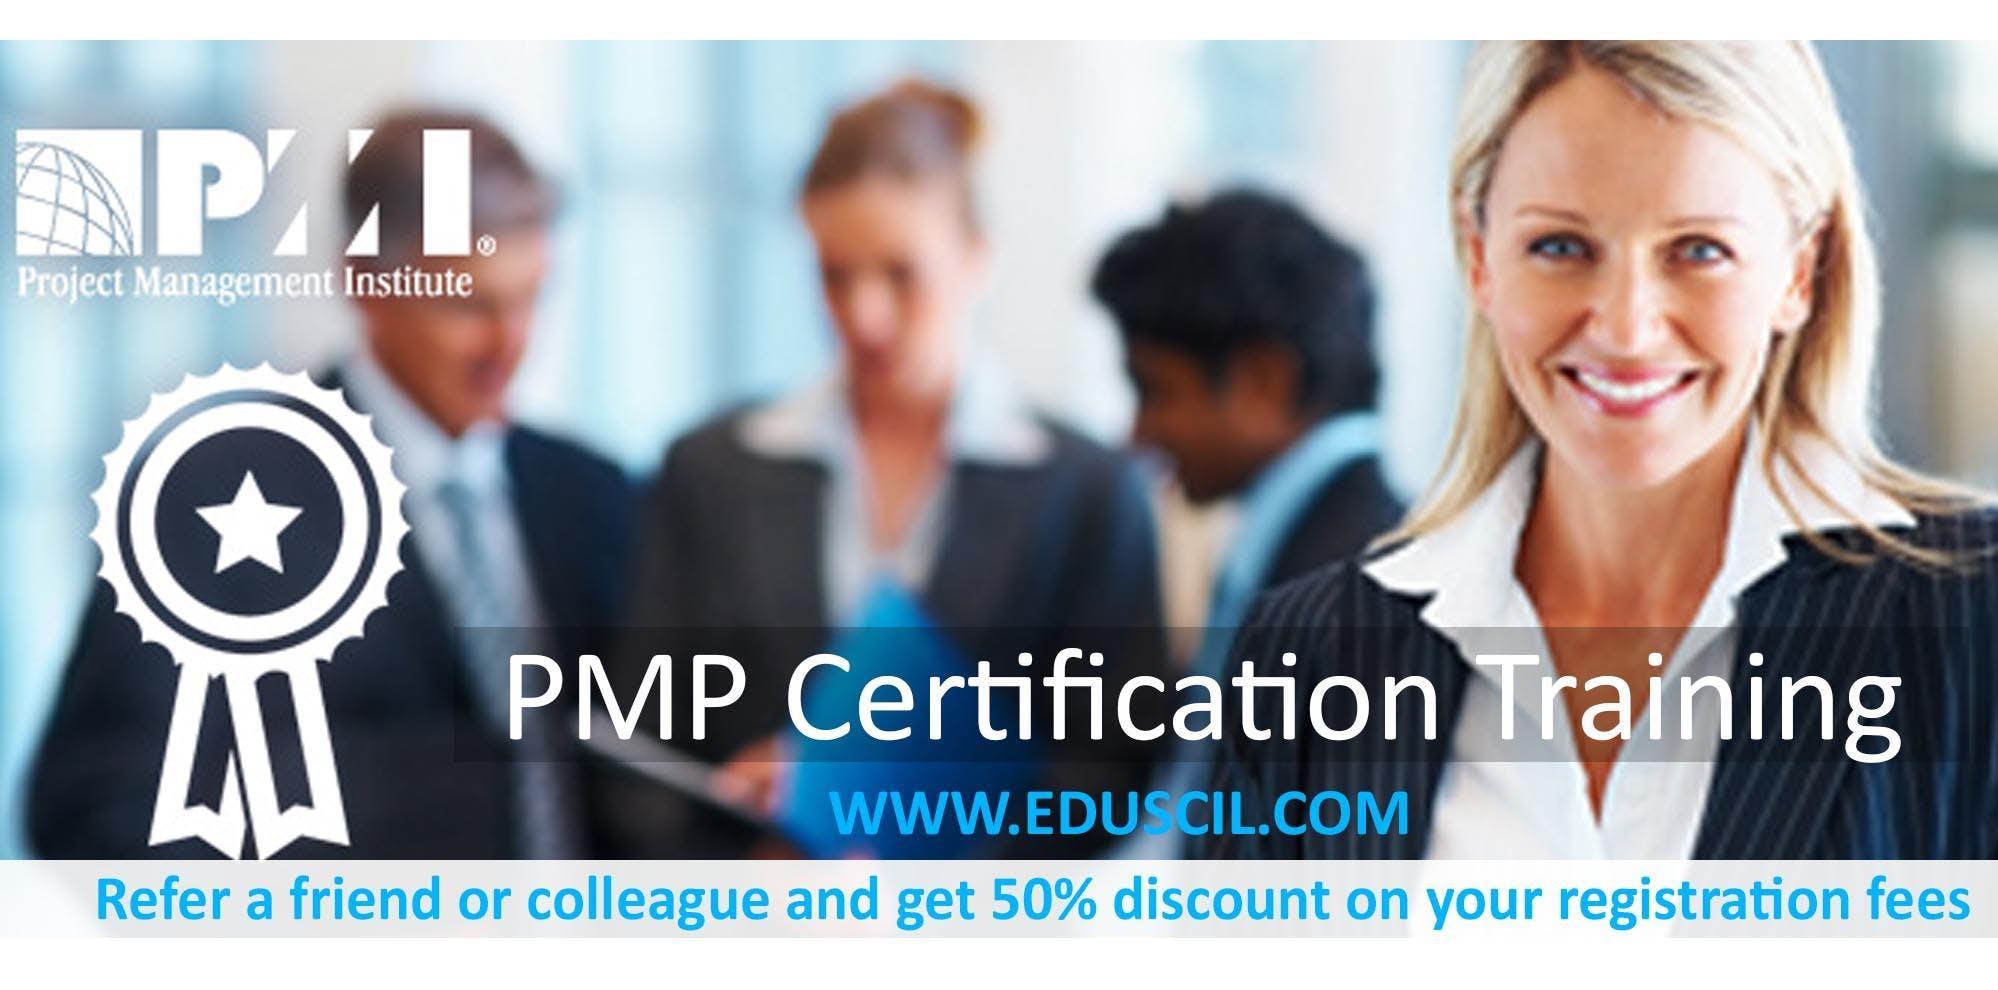 Pmp Classroom Training In Sacramento Ca Usa Eduscil 23 Jun 2018